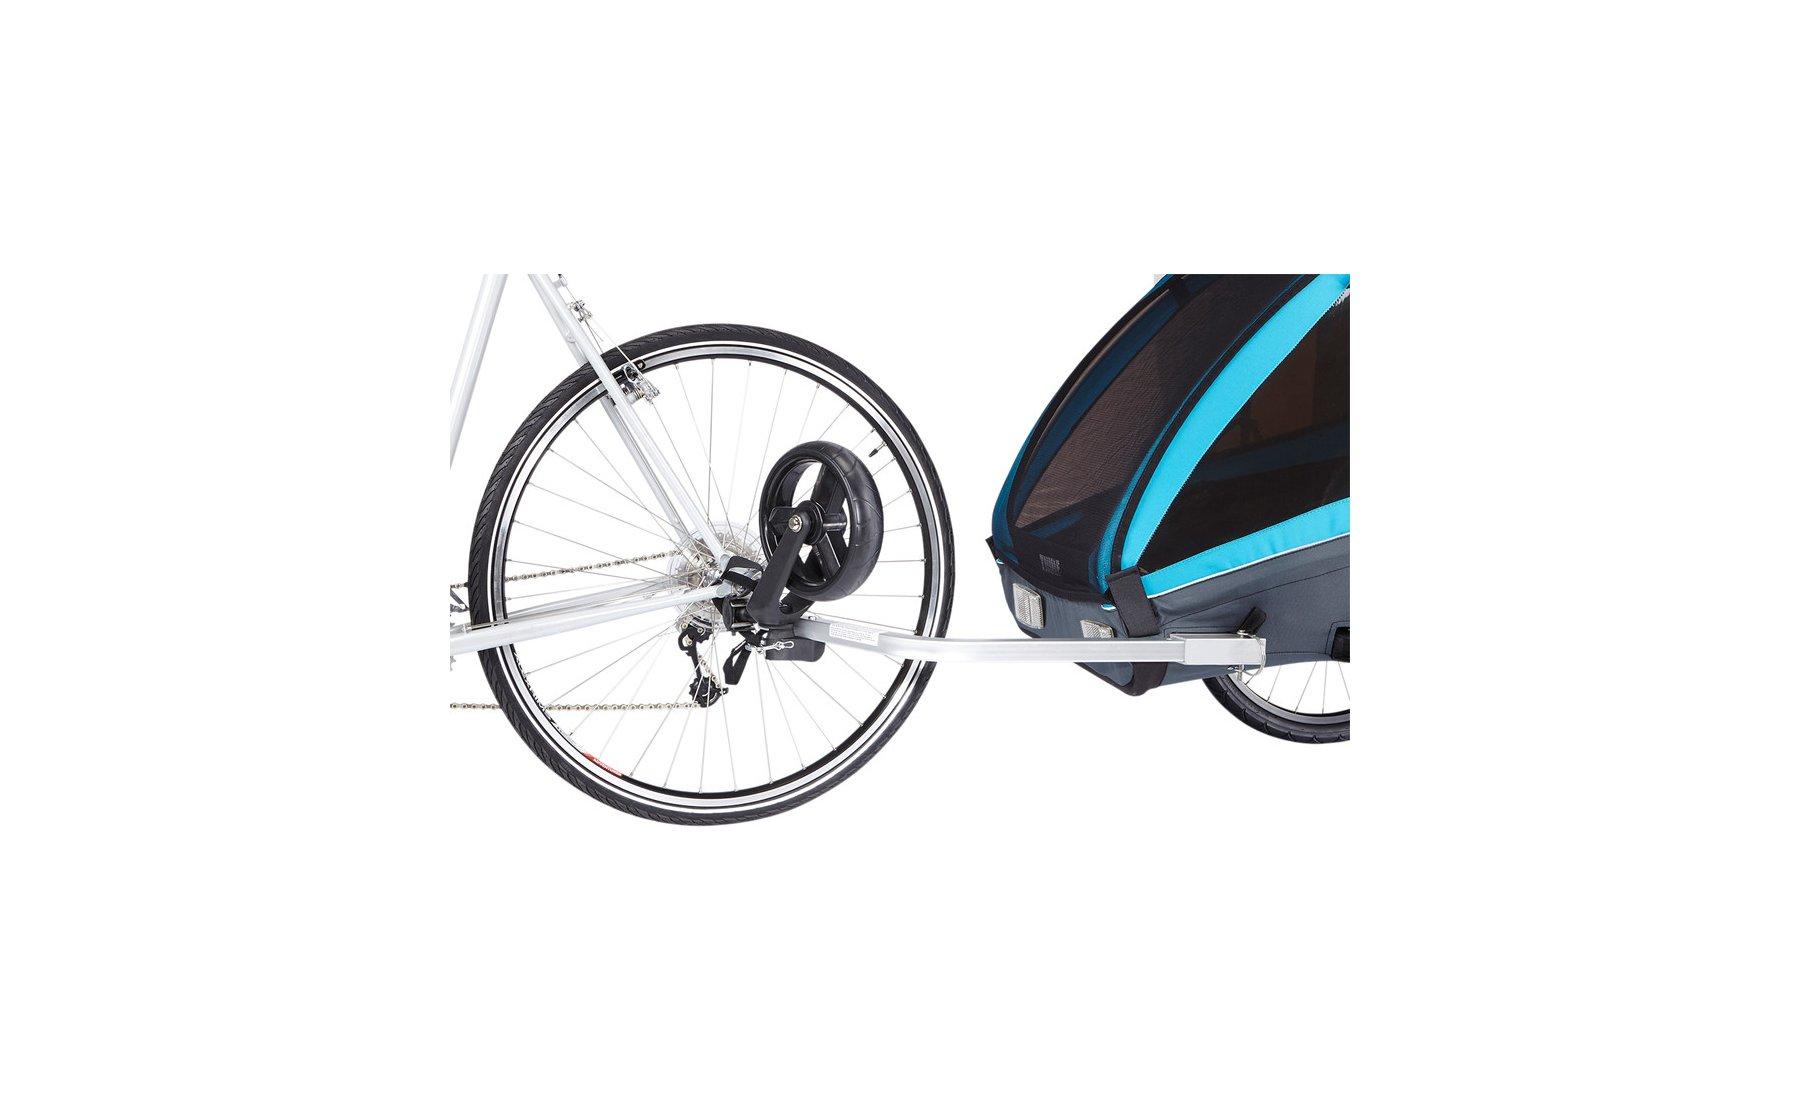 Thule Coaster XT Fahrradanhänger 2020 bestellen   Fahrrad XXL